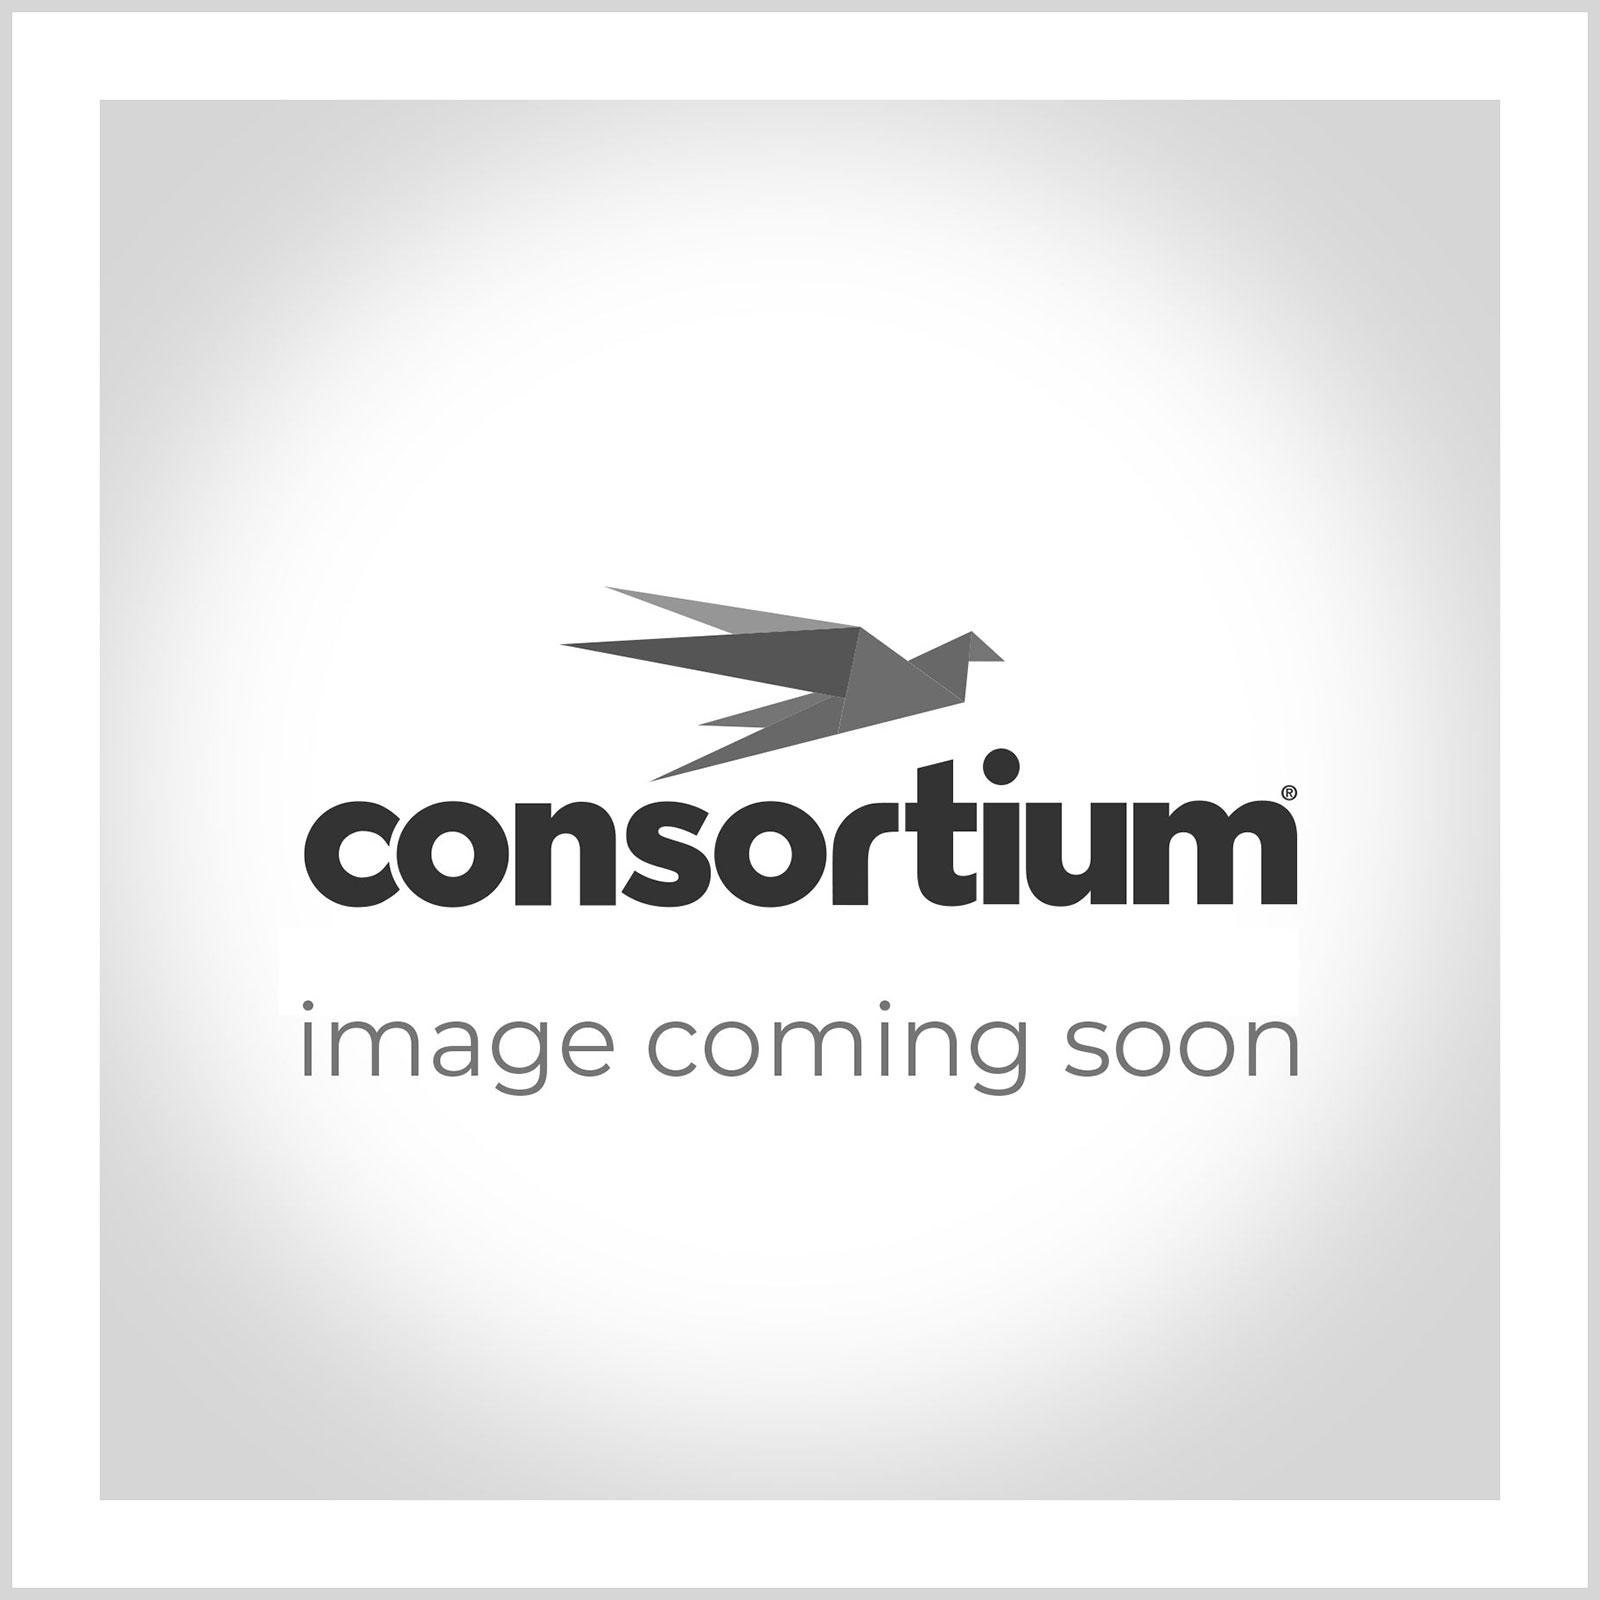 Paper Maché Cones